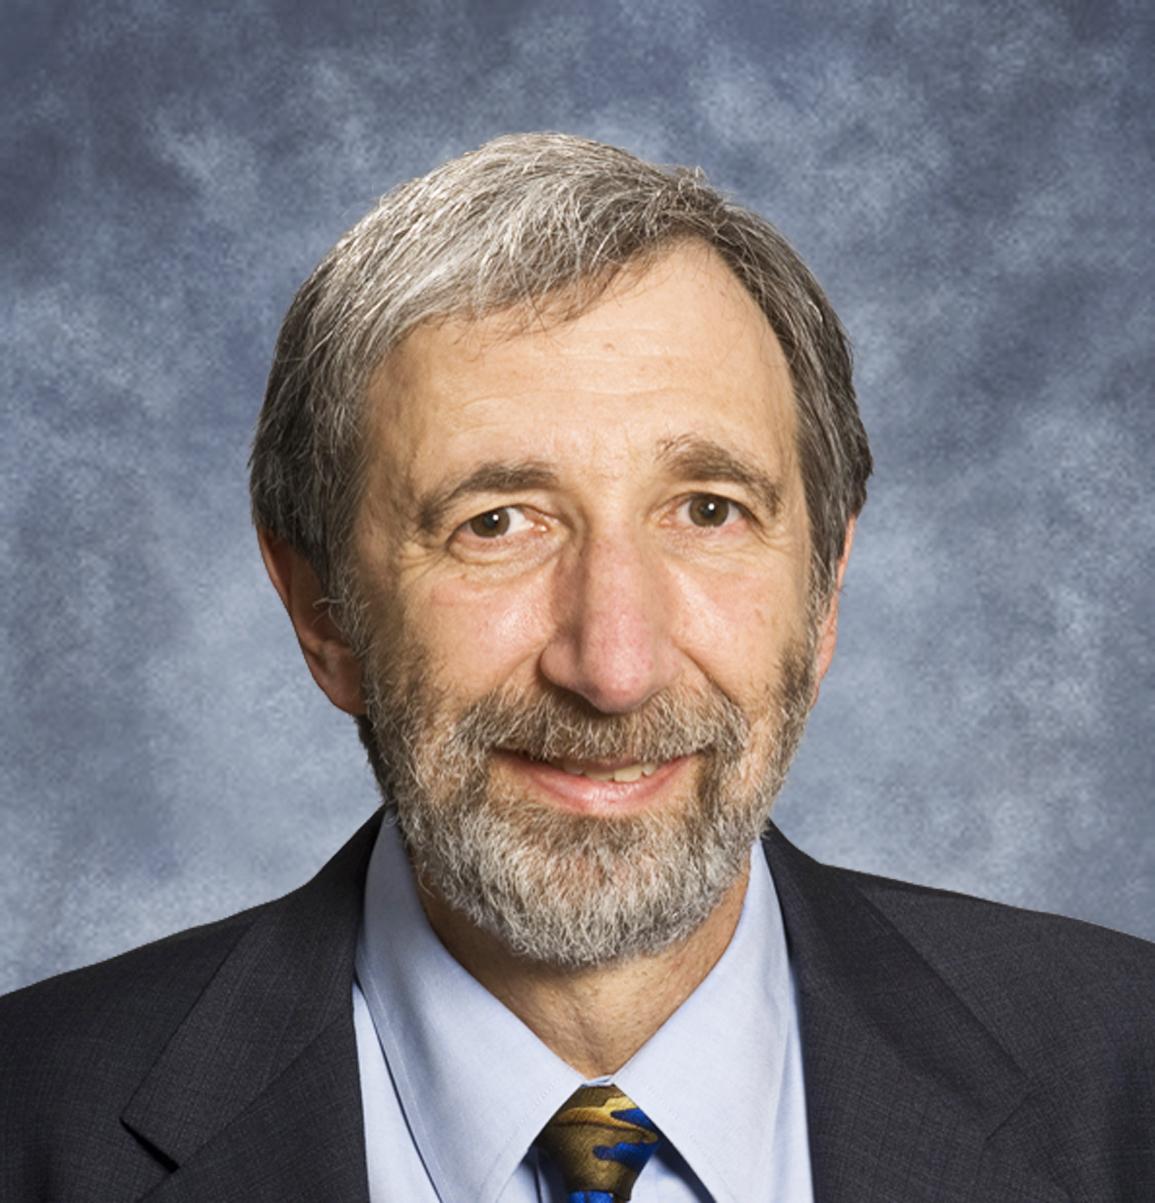 Paul Glassman, DDS, MBA